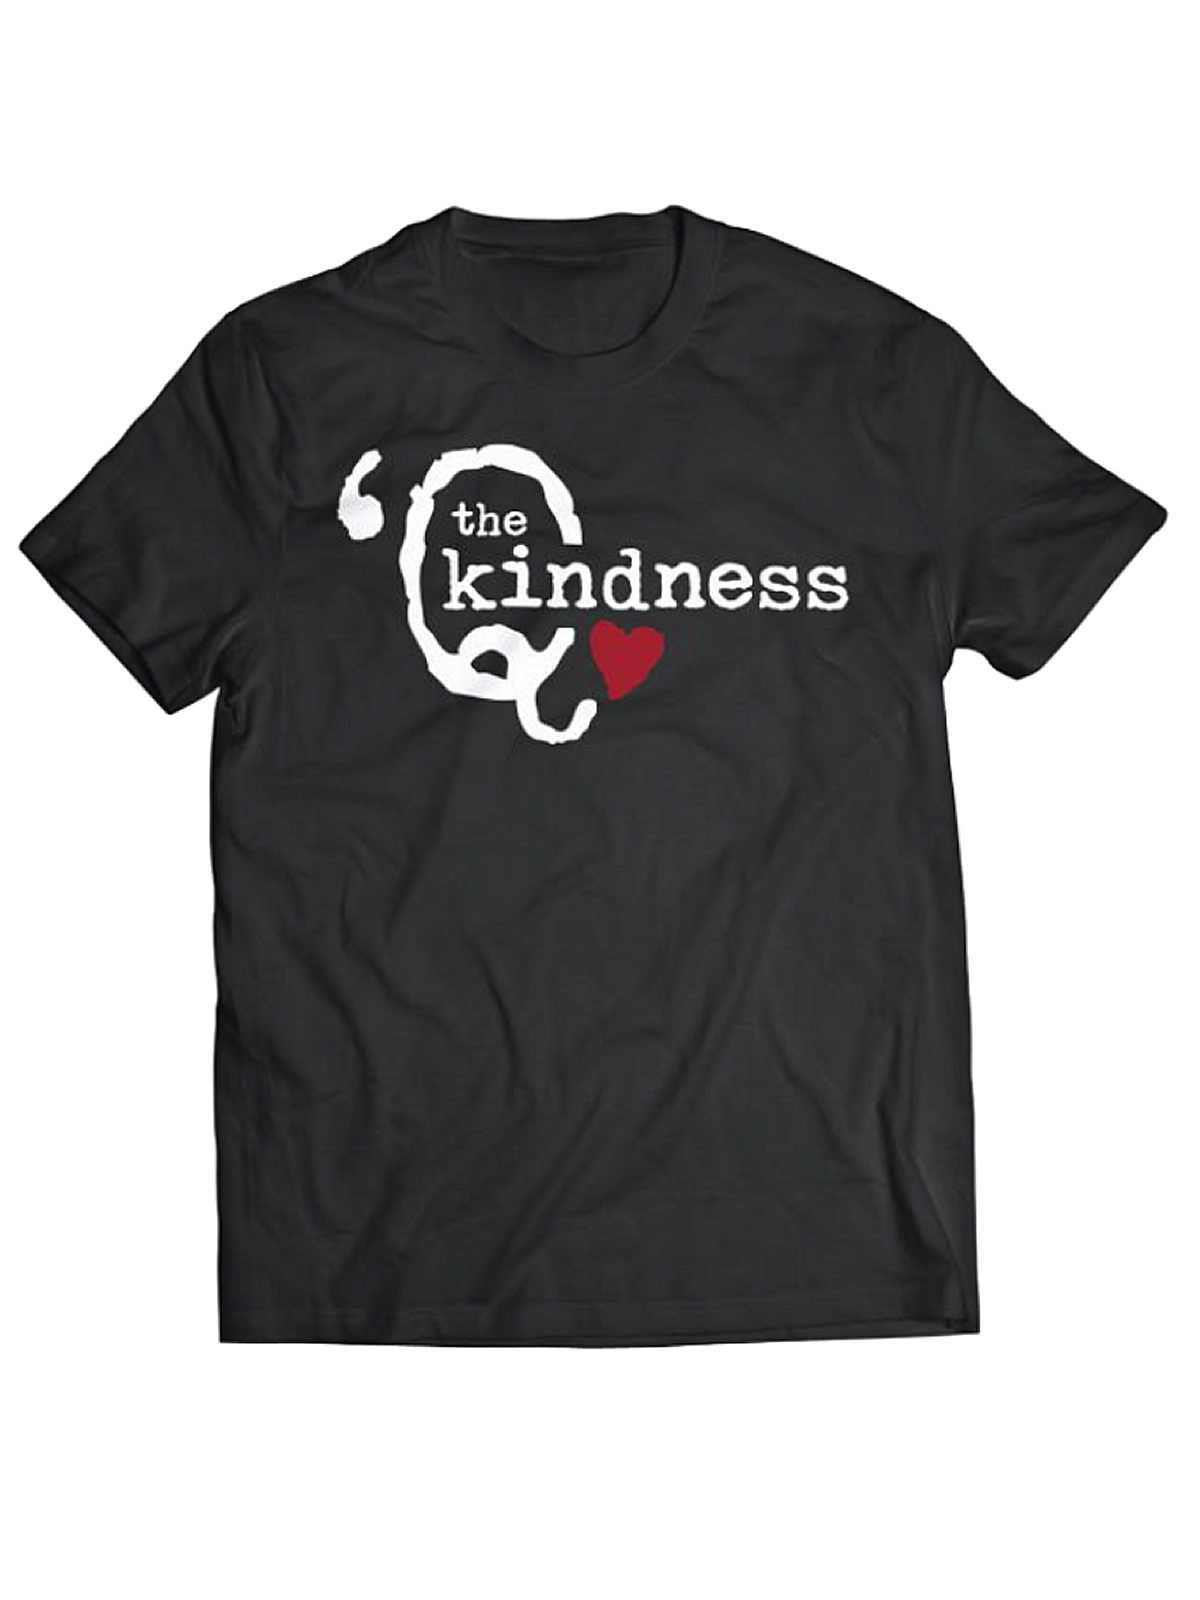 Sonny's 'Q The Kindness T-shirt: Fan Favorite Tee. PC450 – Black